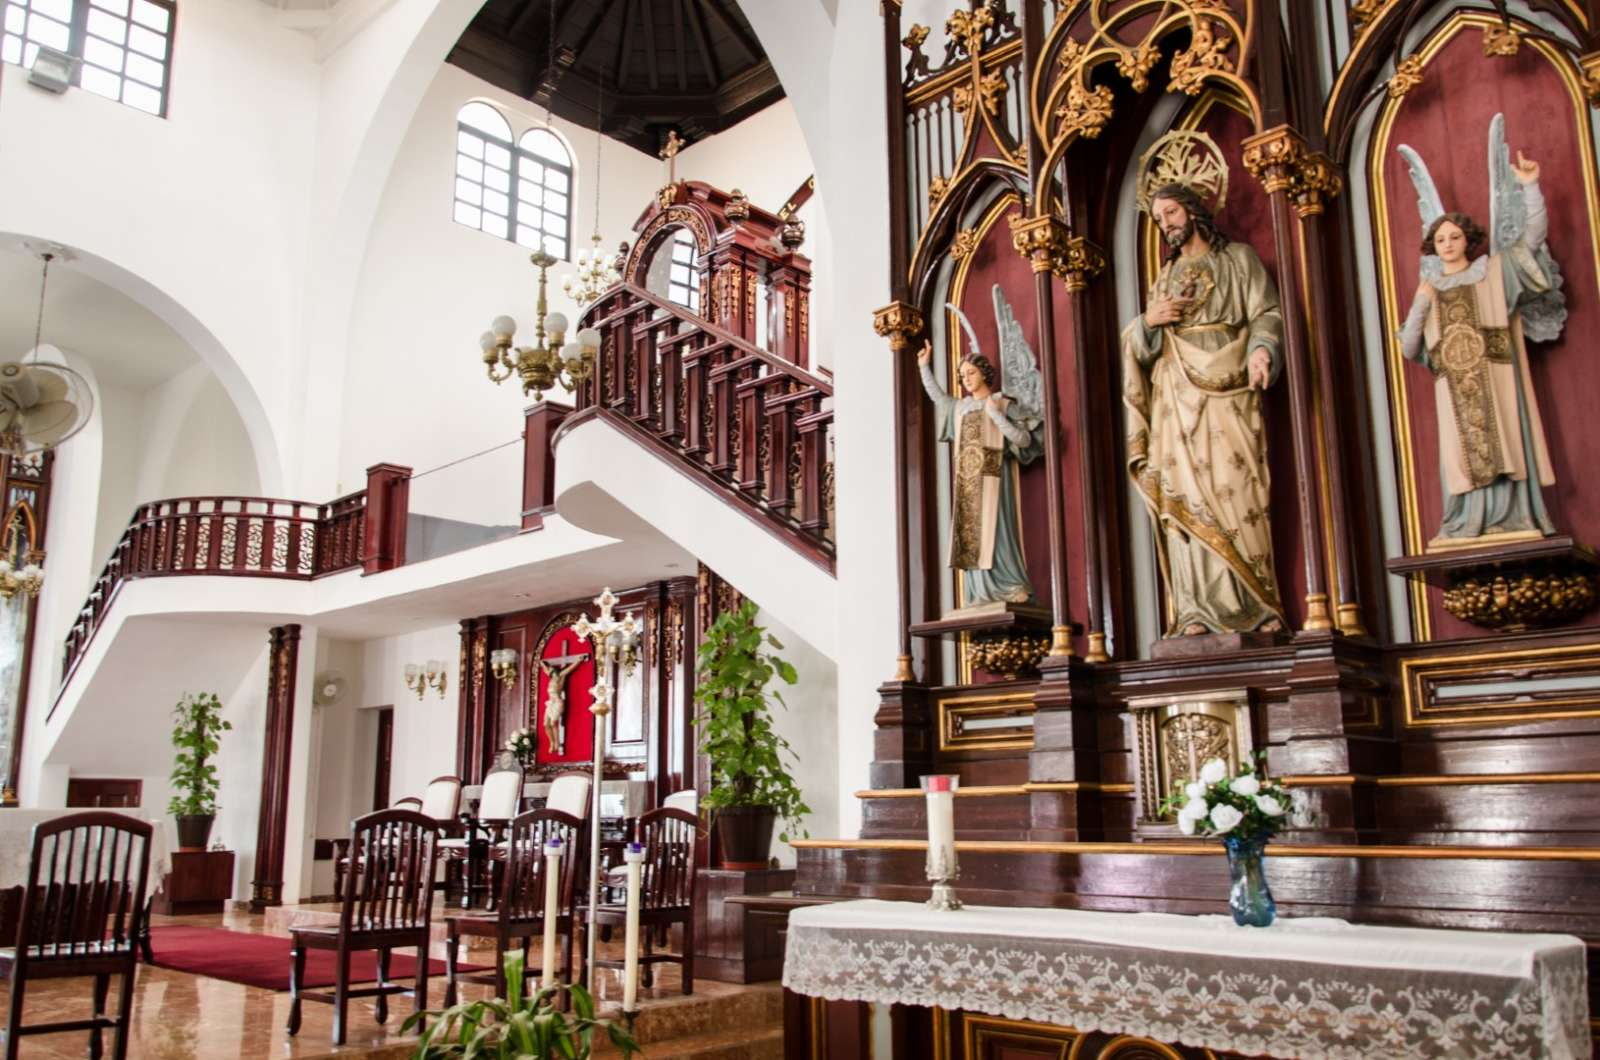 Church interior in Santa Clara, Cuba